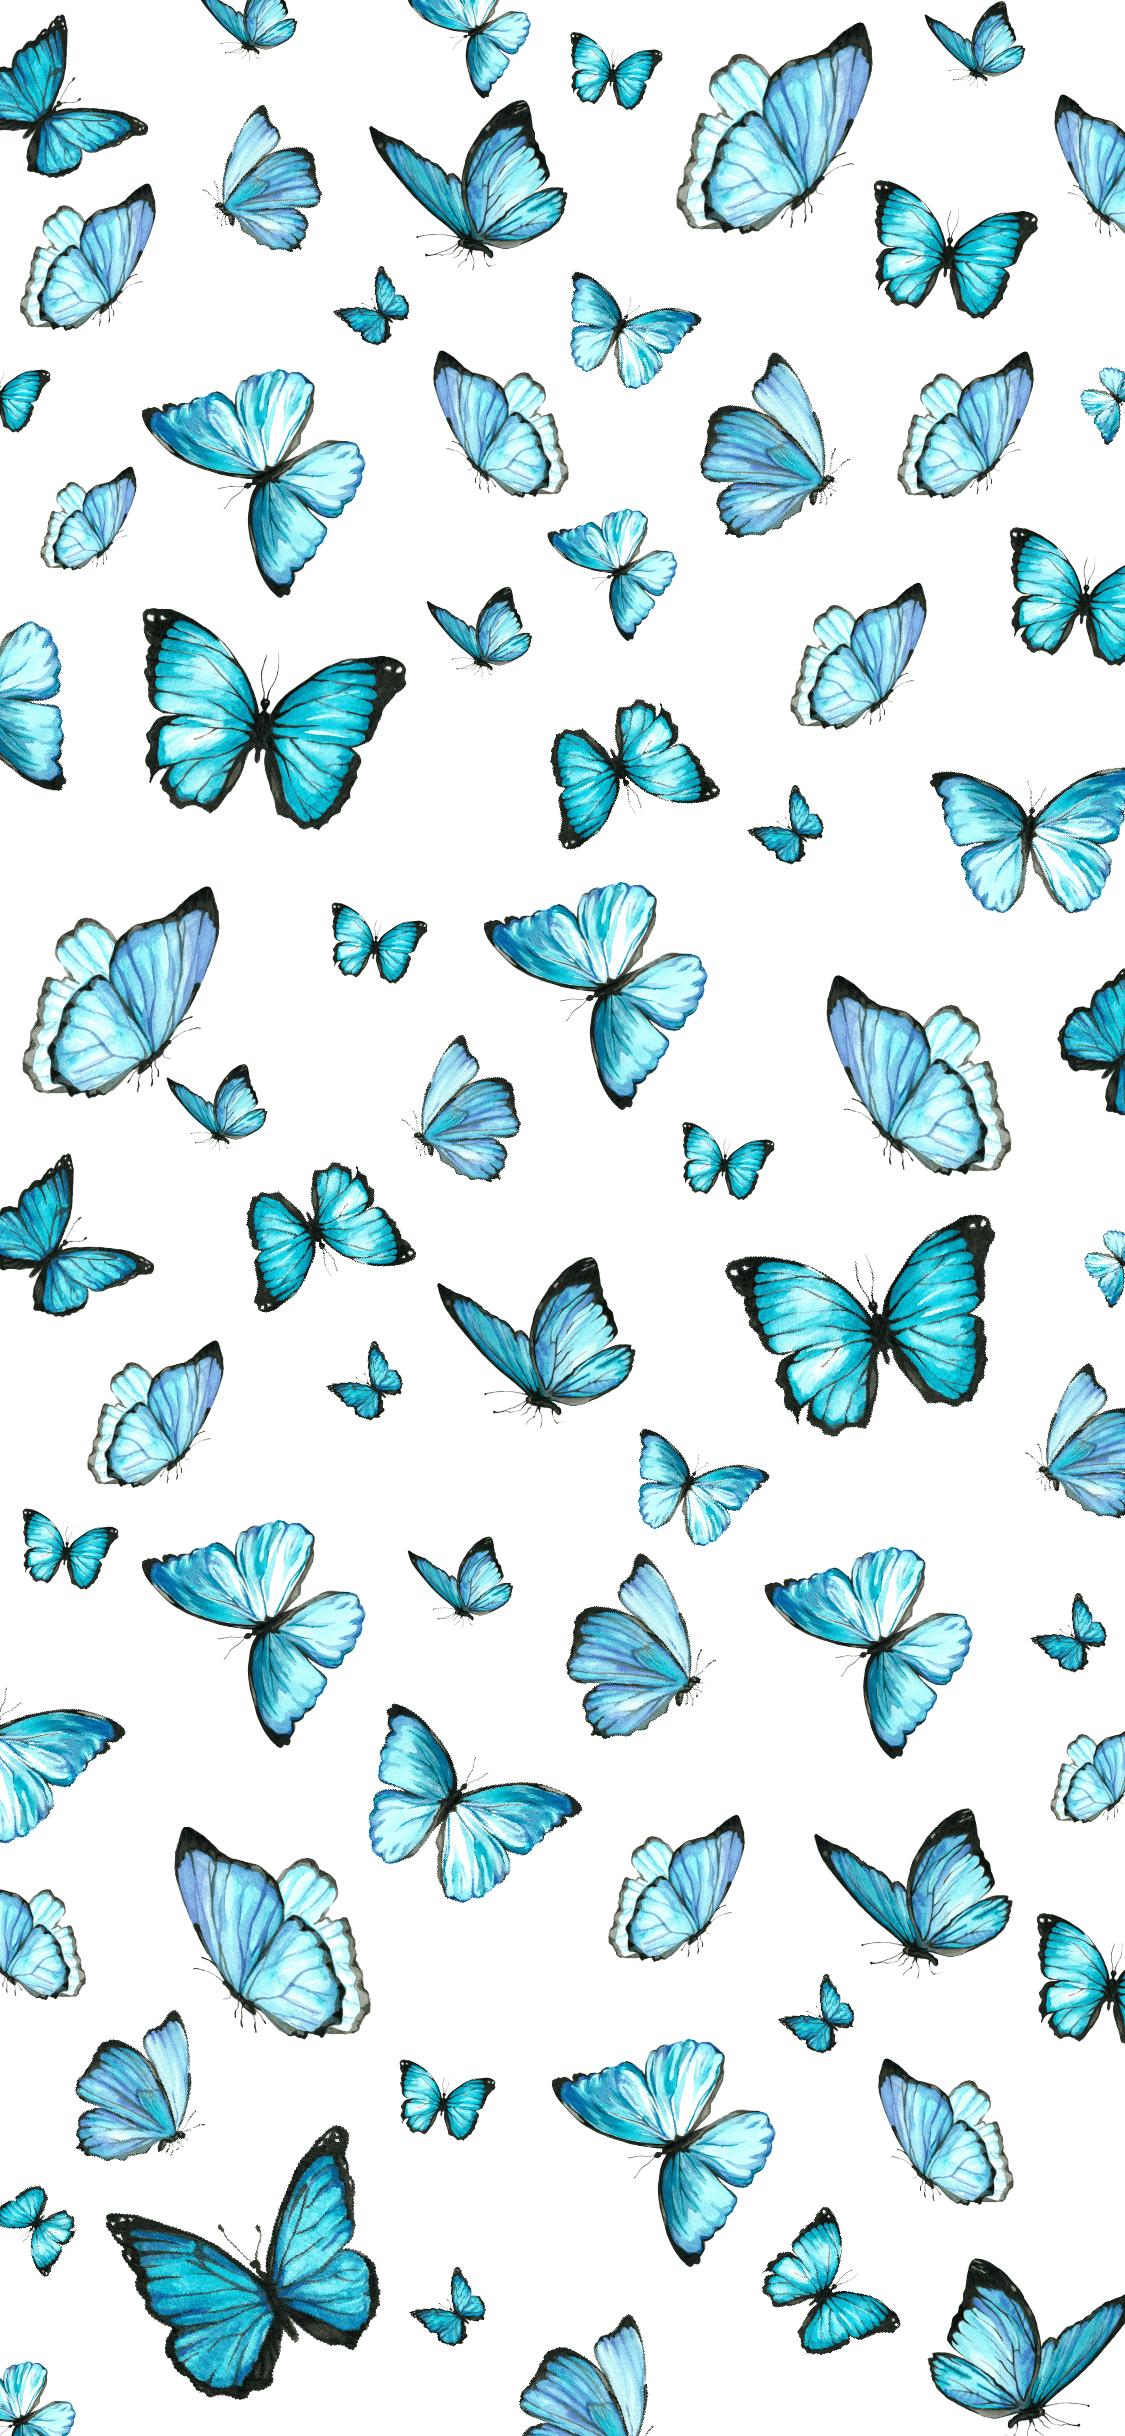 Butterfly Emoji Wallpapers Top Free Butterfly Emoji Backgrounds Wallpaperaccess